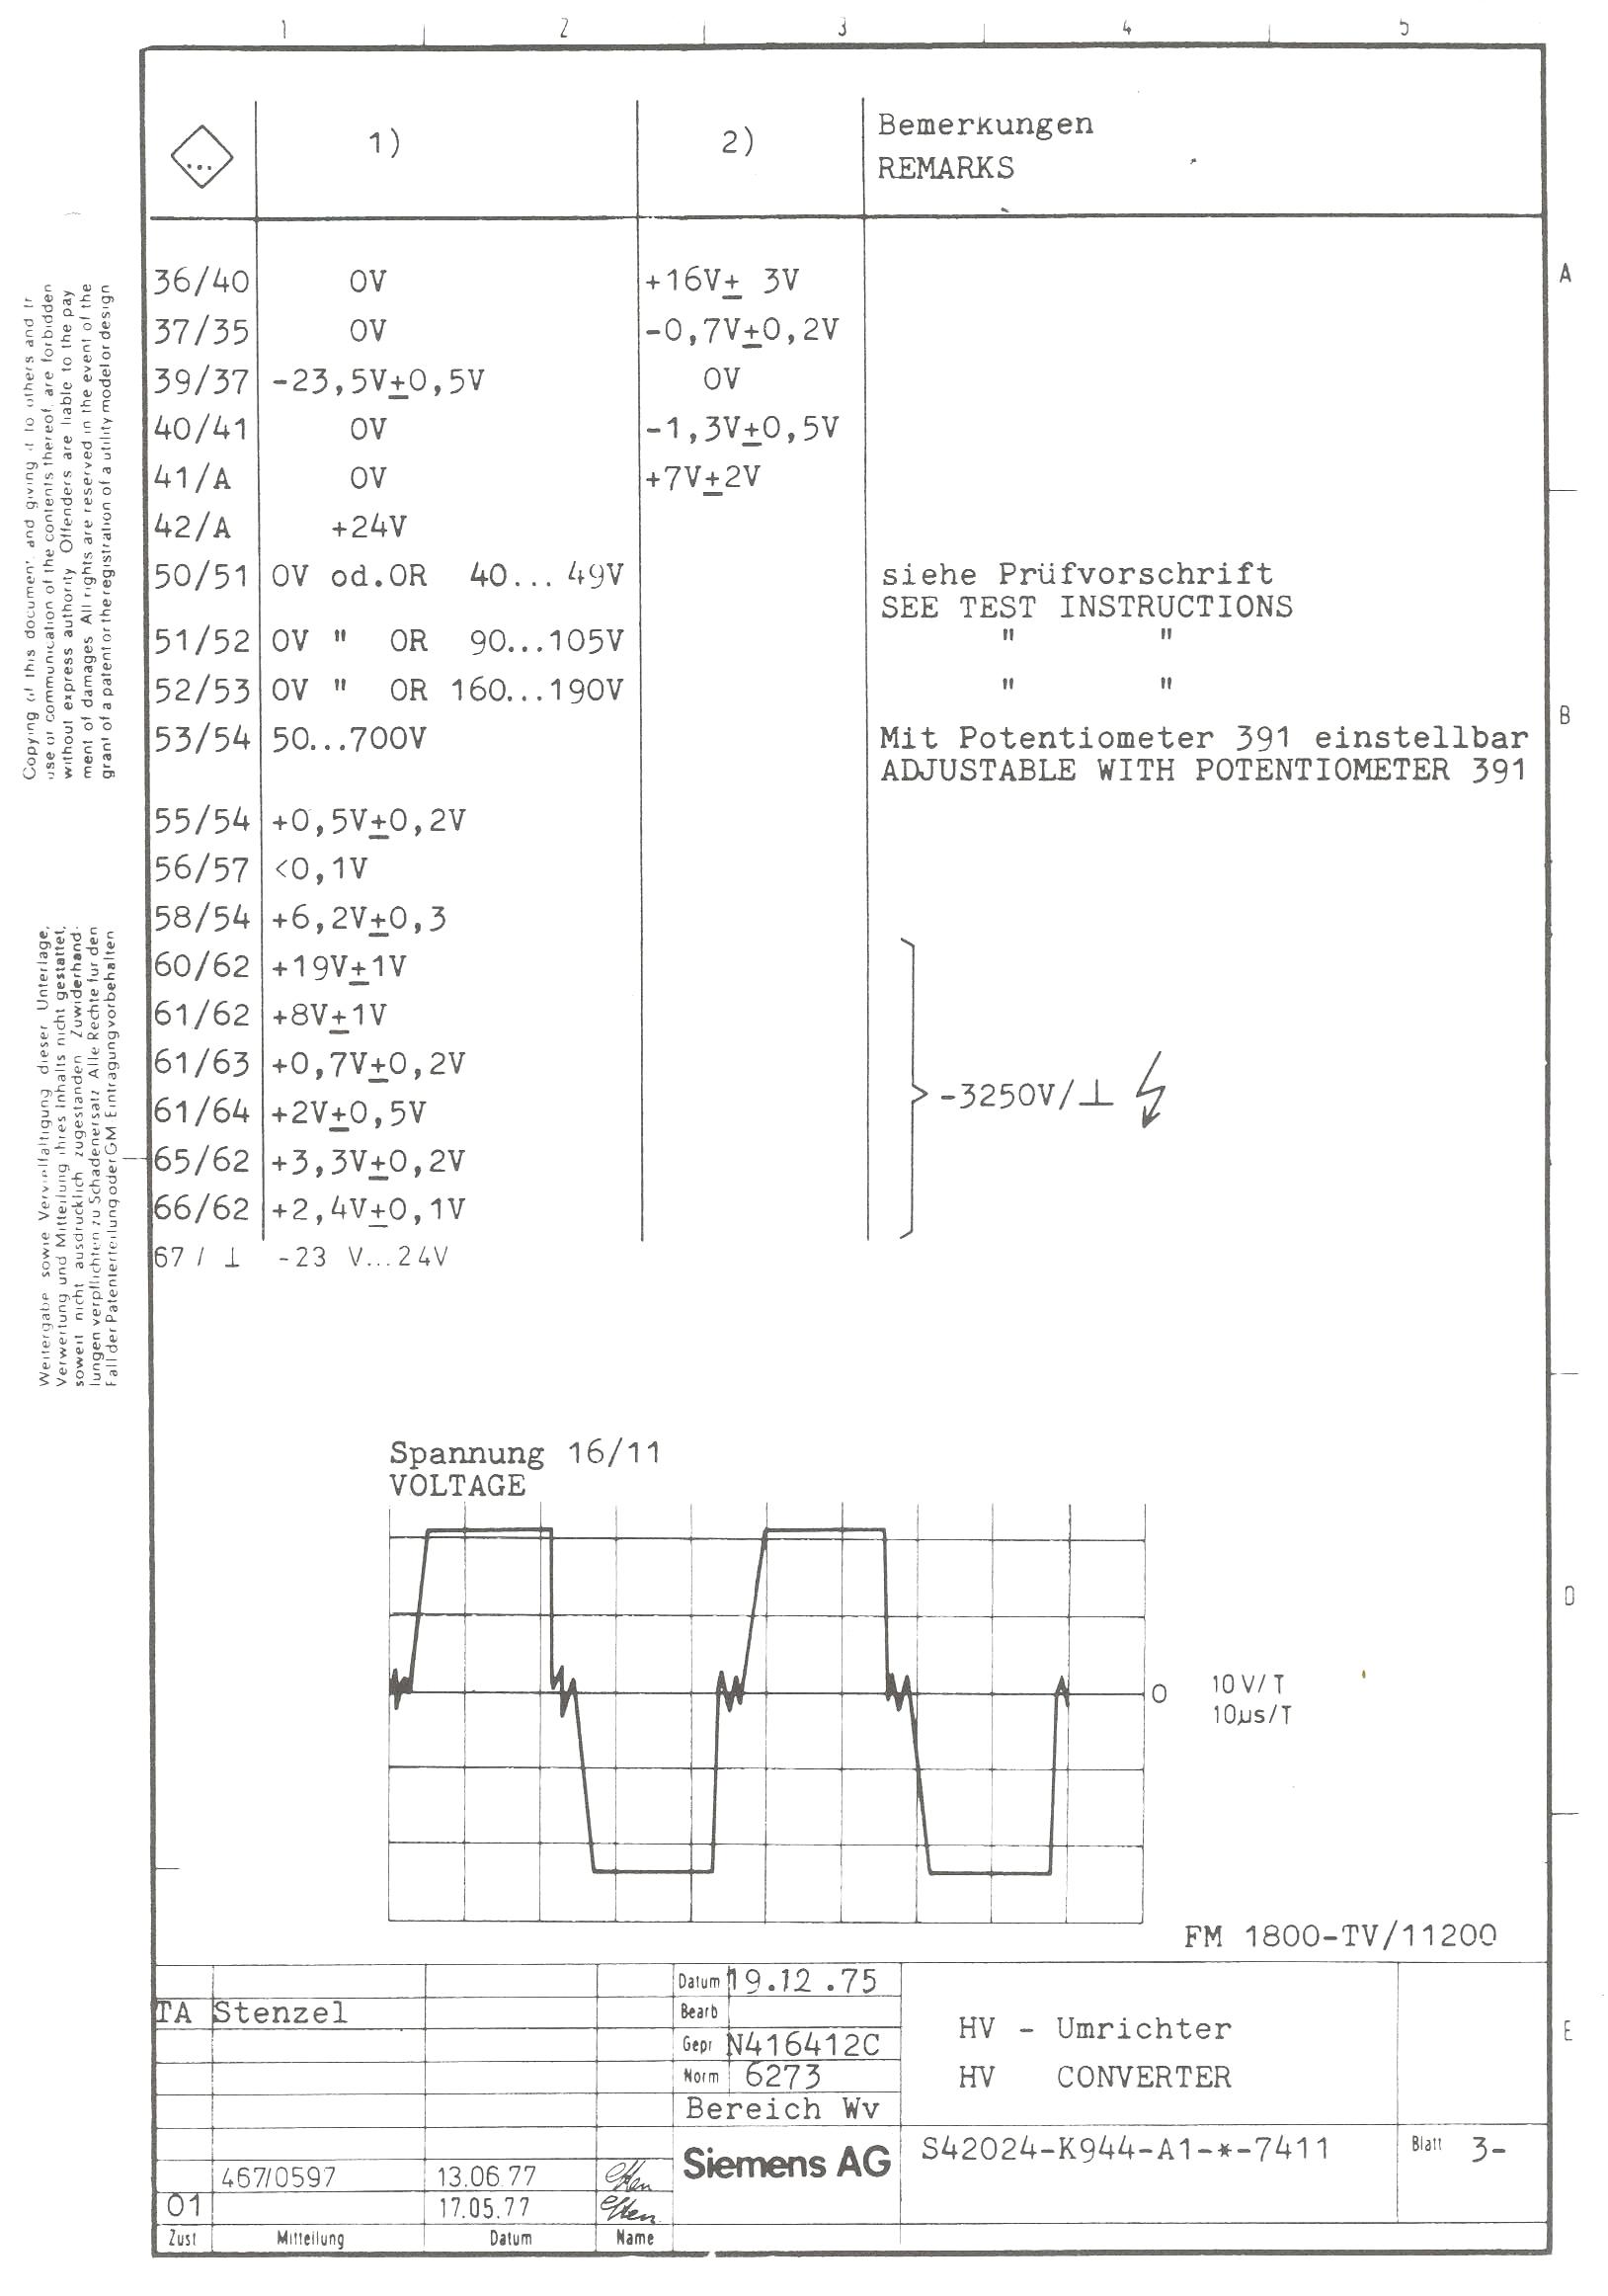 wiring diagram for sony xplod car stereo inspirational jvc wiring diagram fresh sony xplod car stereo